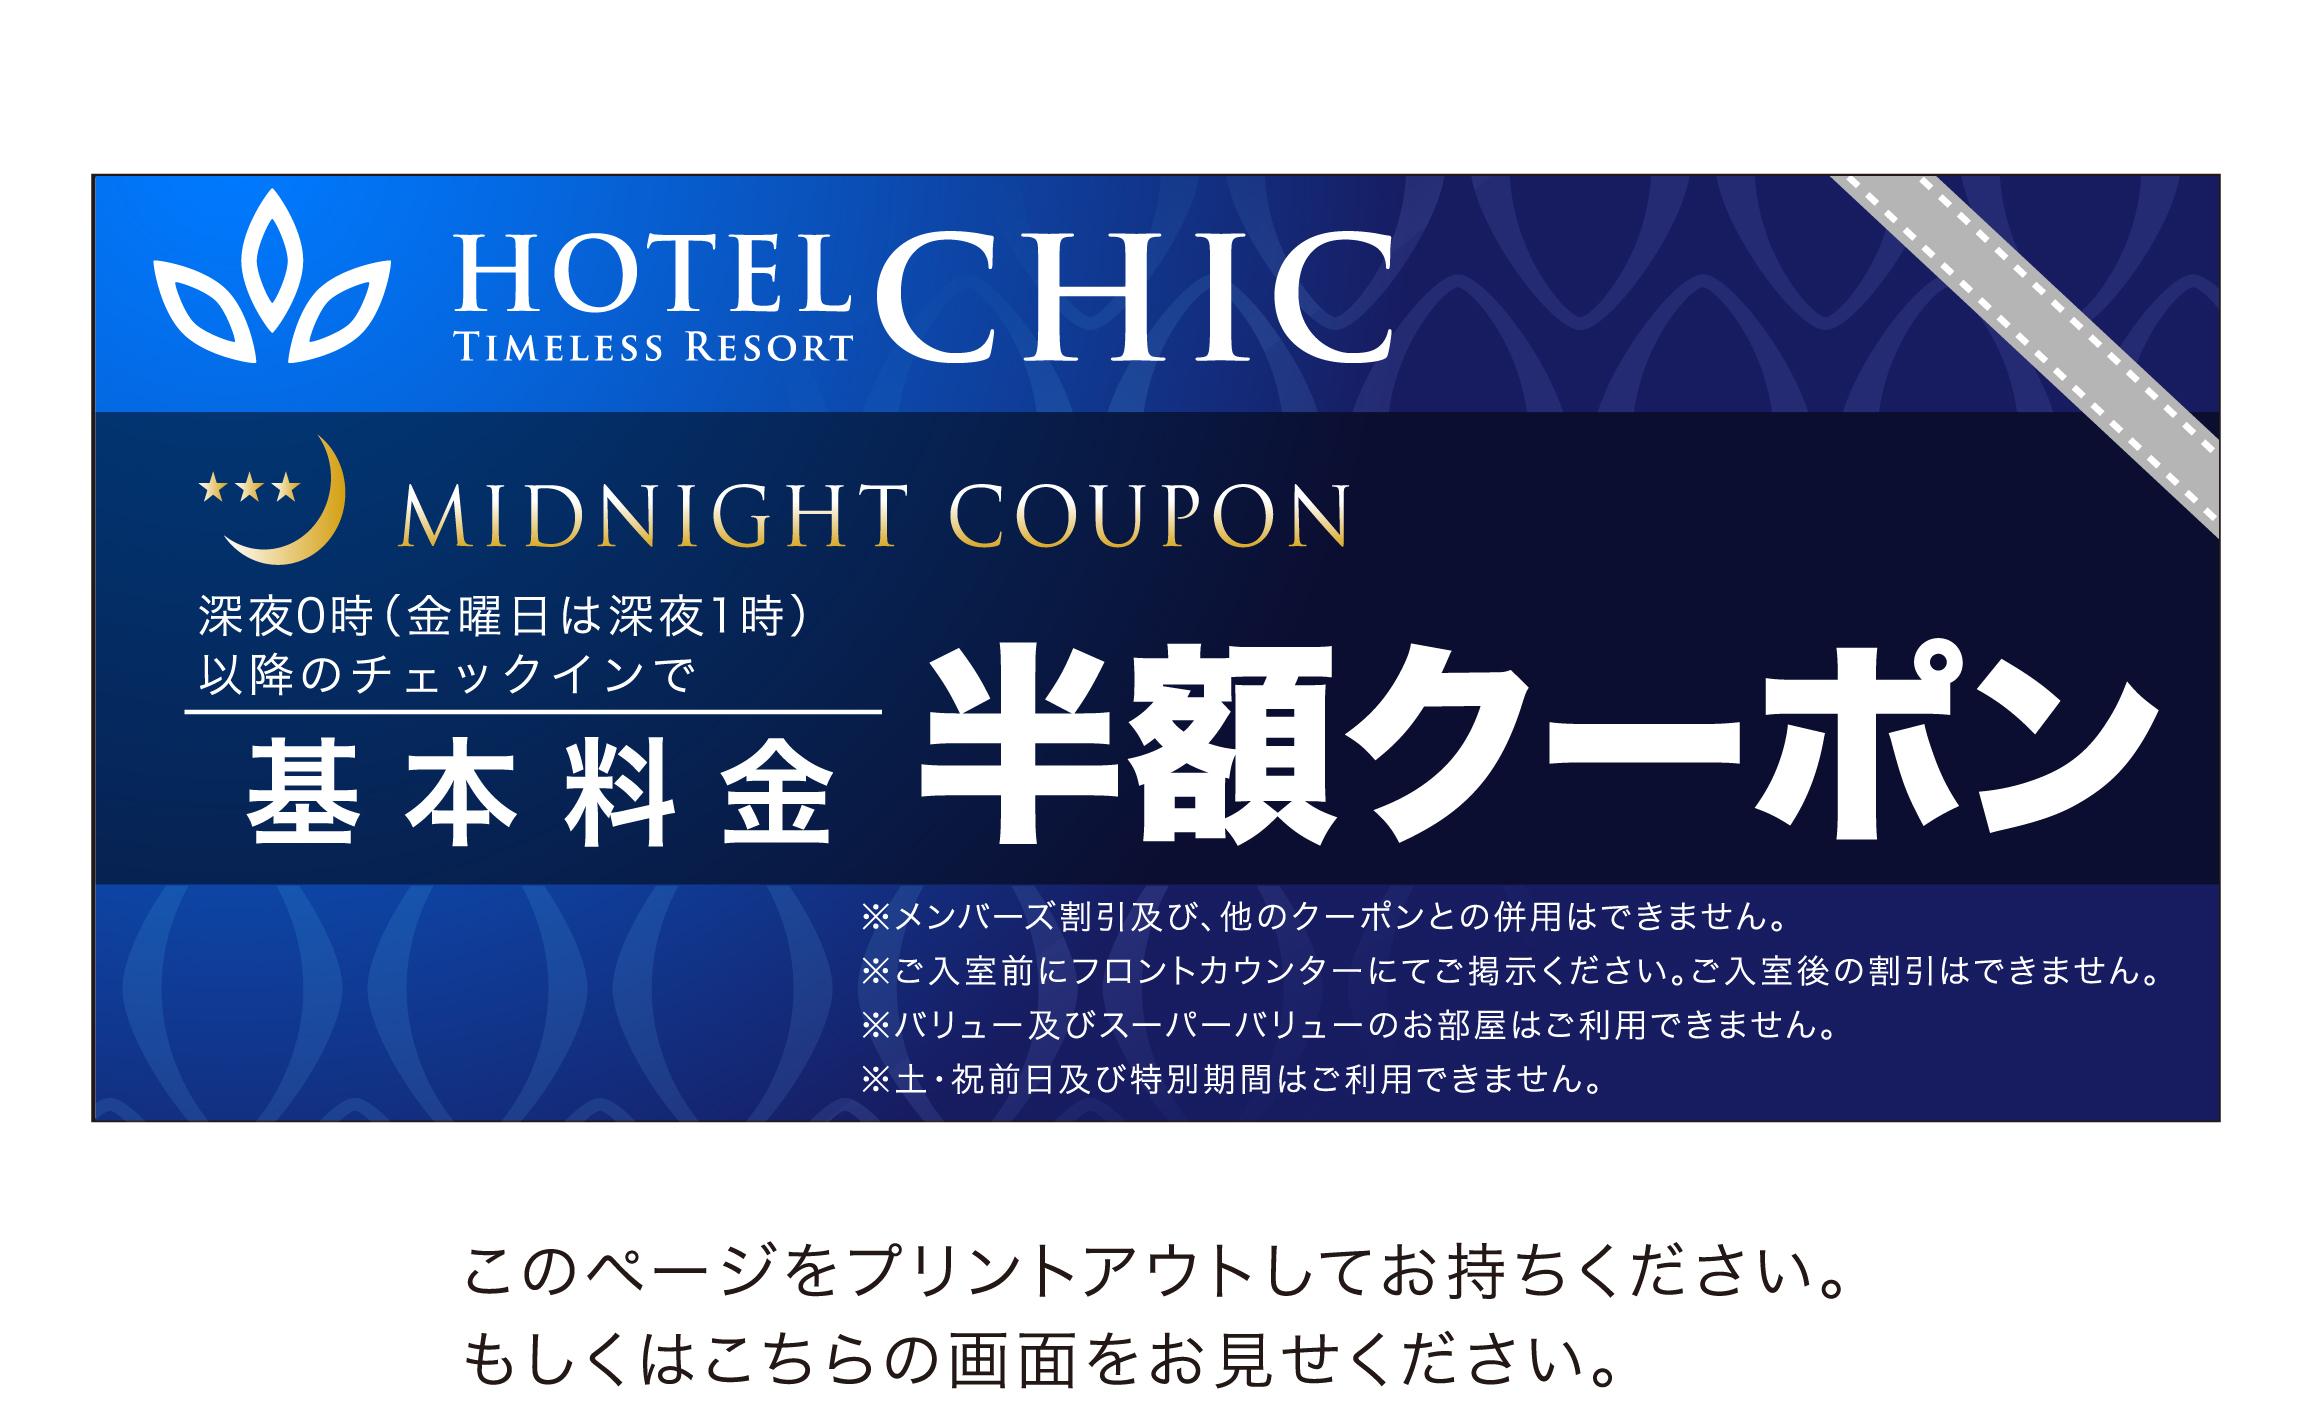 http://www.kobe-chic.com/news/images/midnight_c.jpg